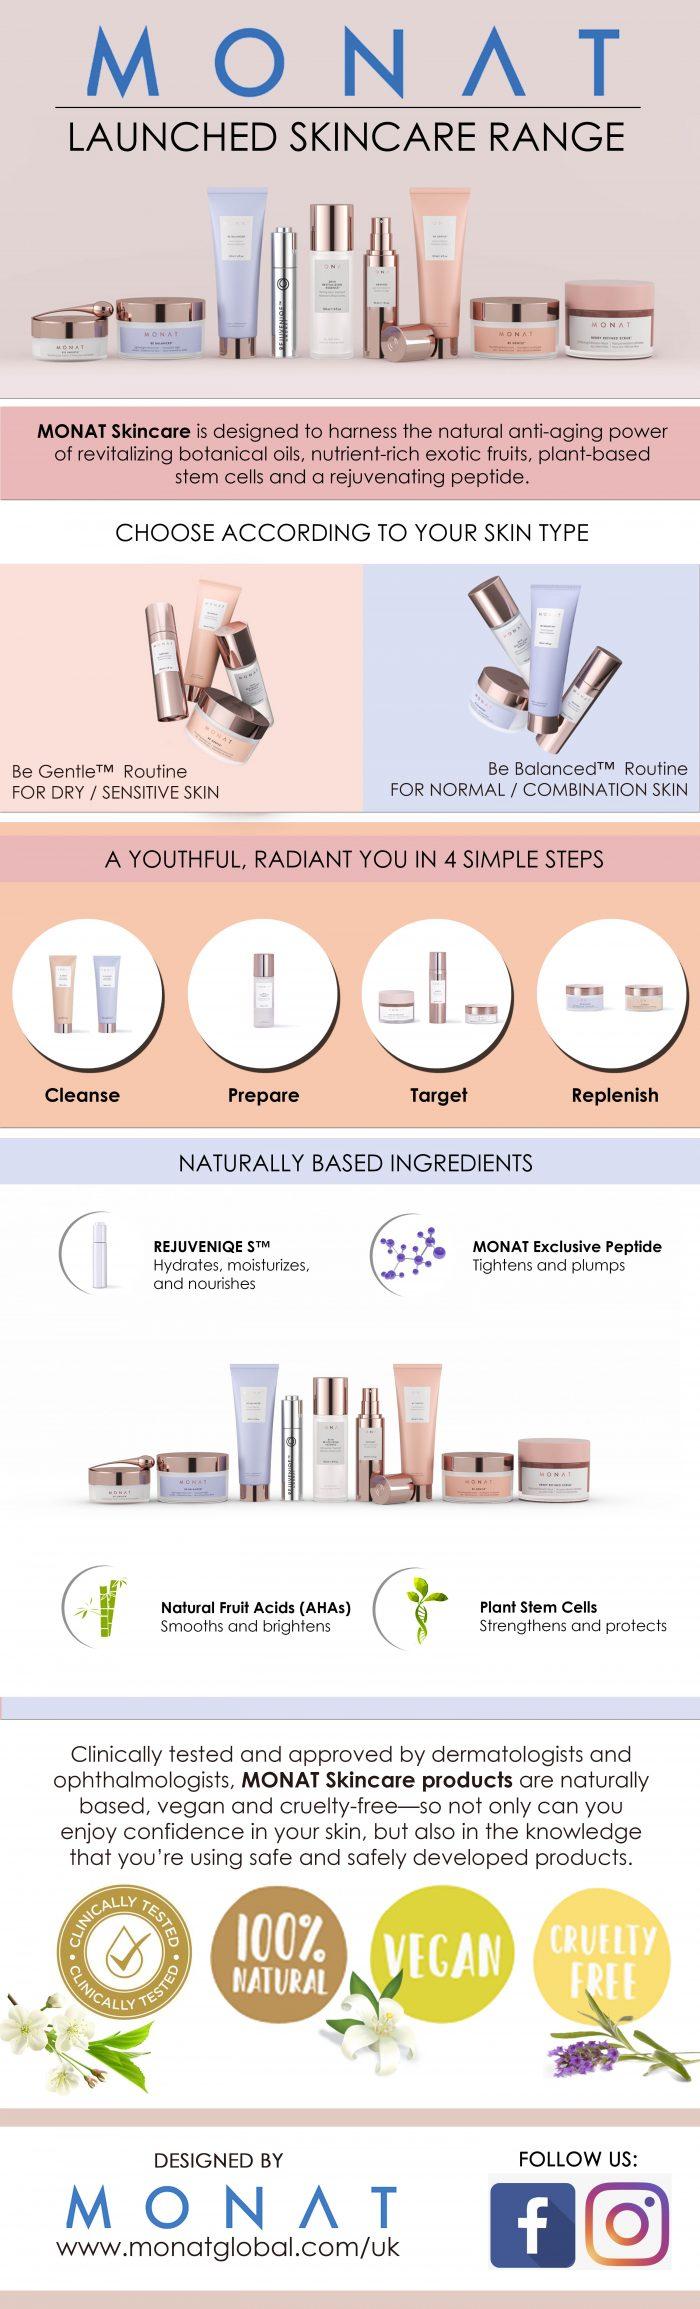 MONAT Launches Skincare Range